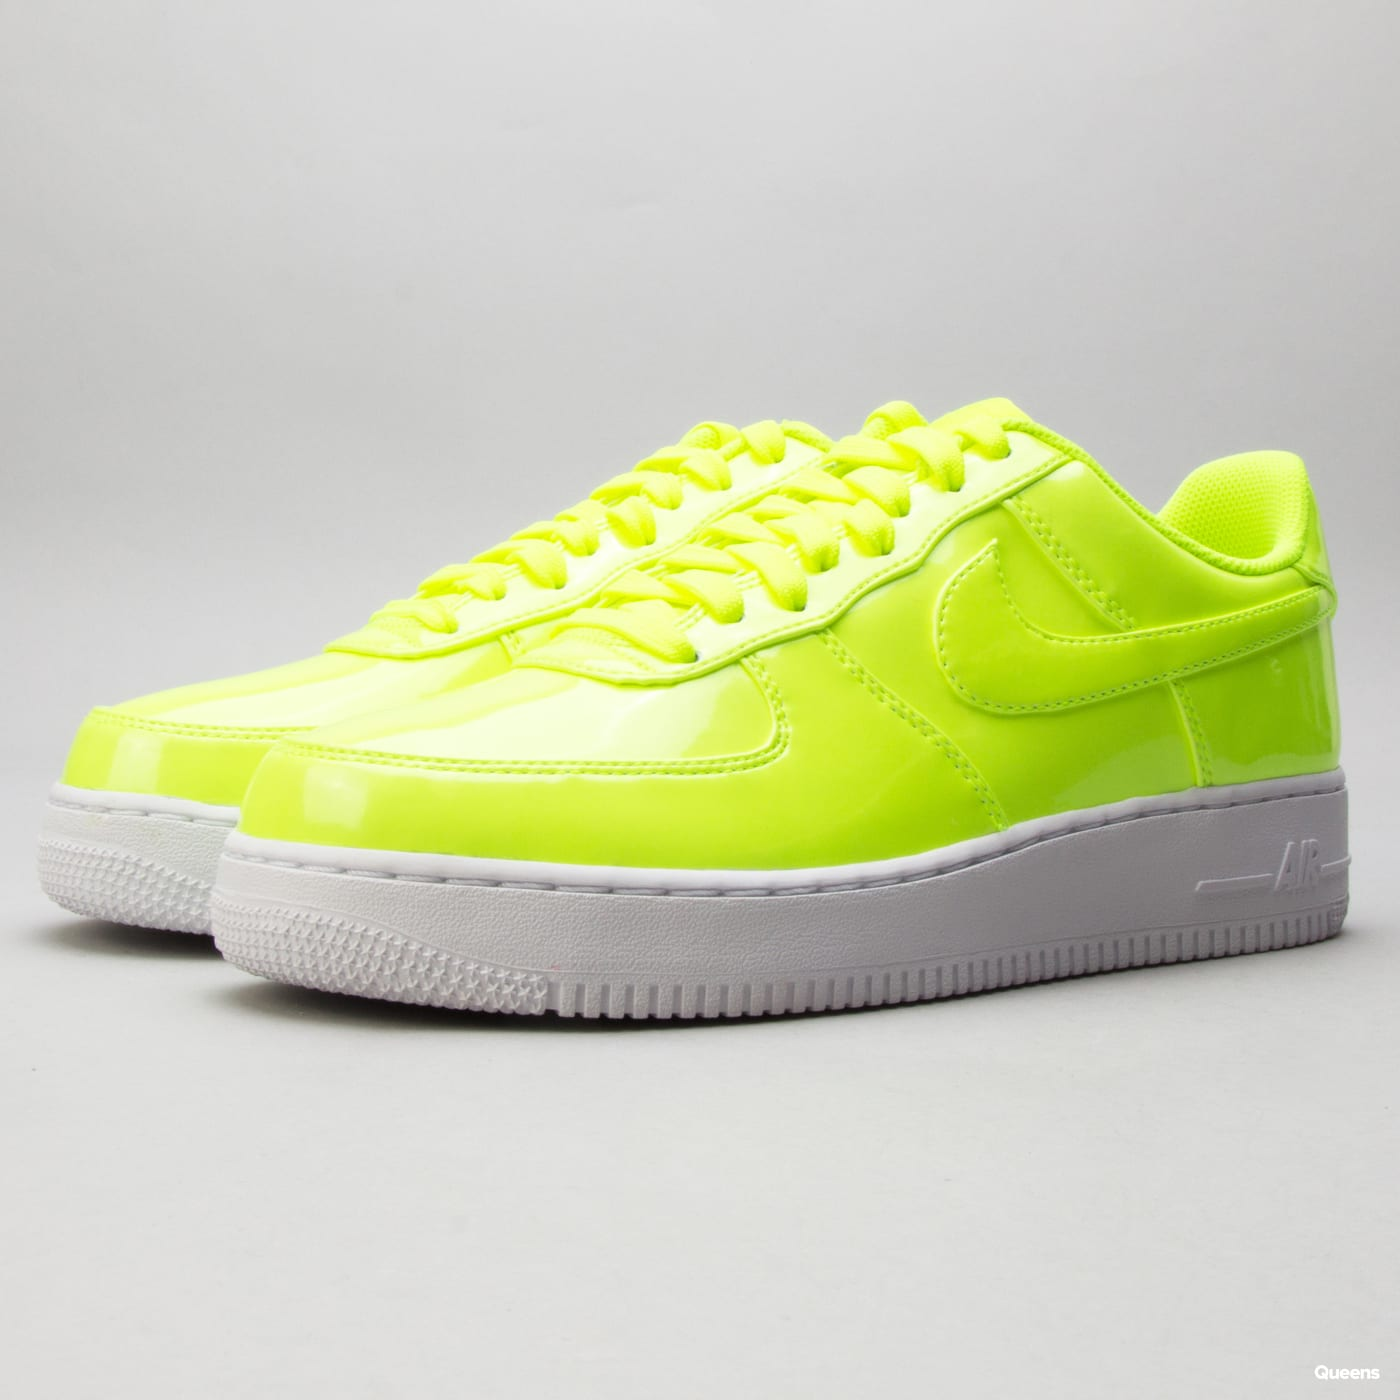 1e80462bc47 Sneakers Nike Air Force 1  07 LV8 UV (AJ9505-700)– Queens 💚